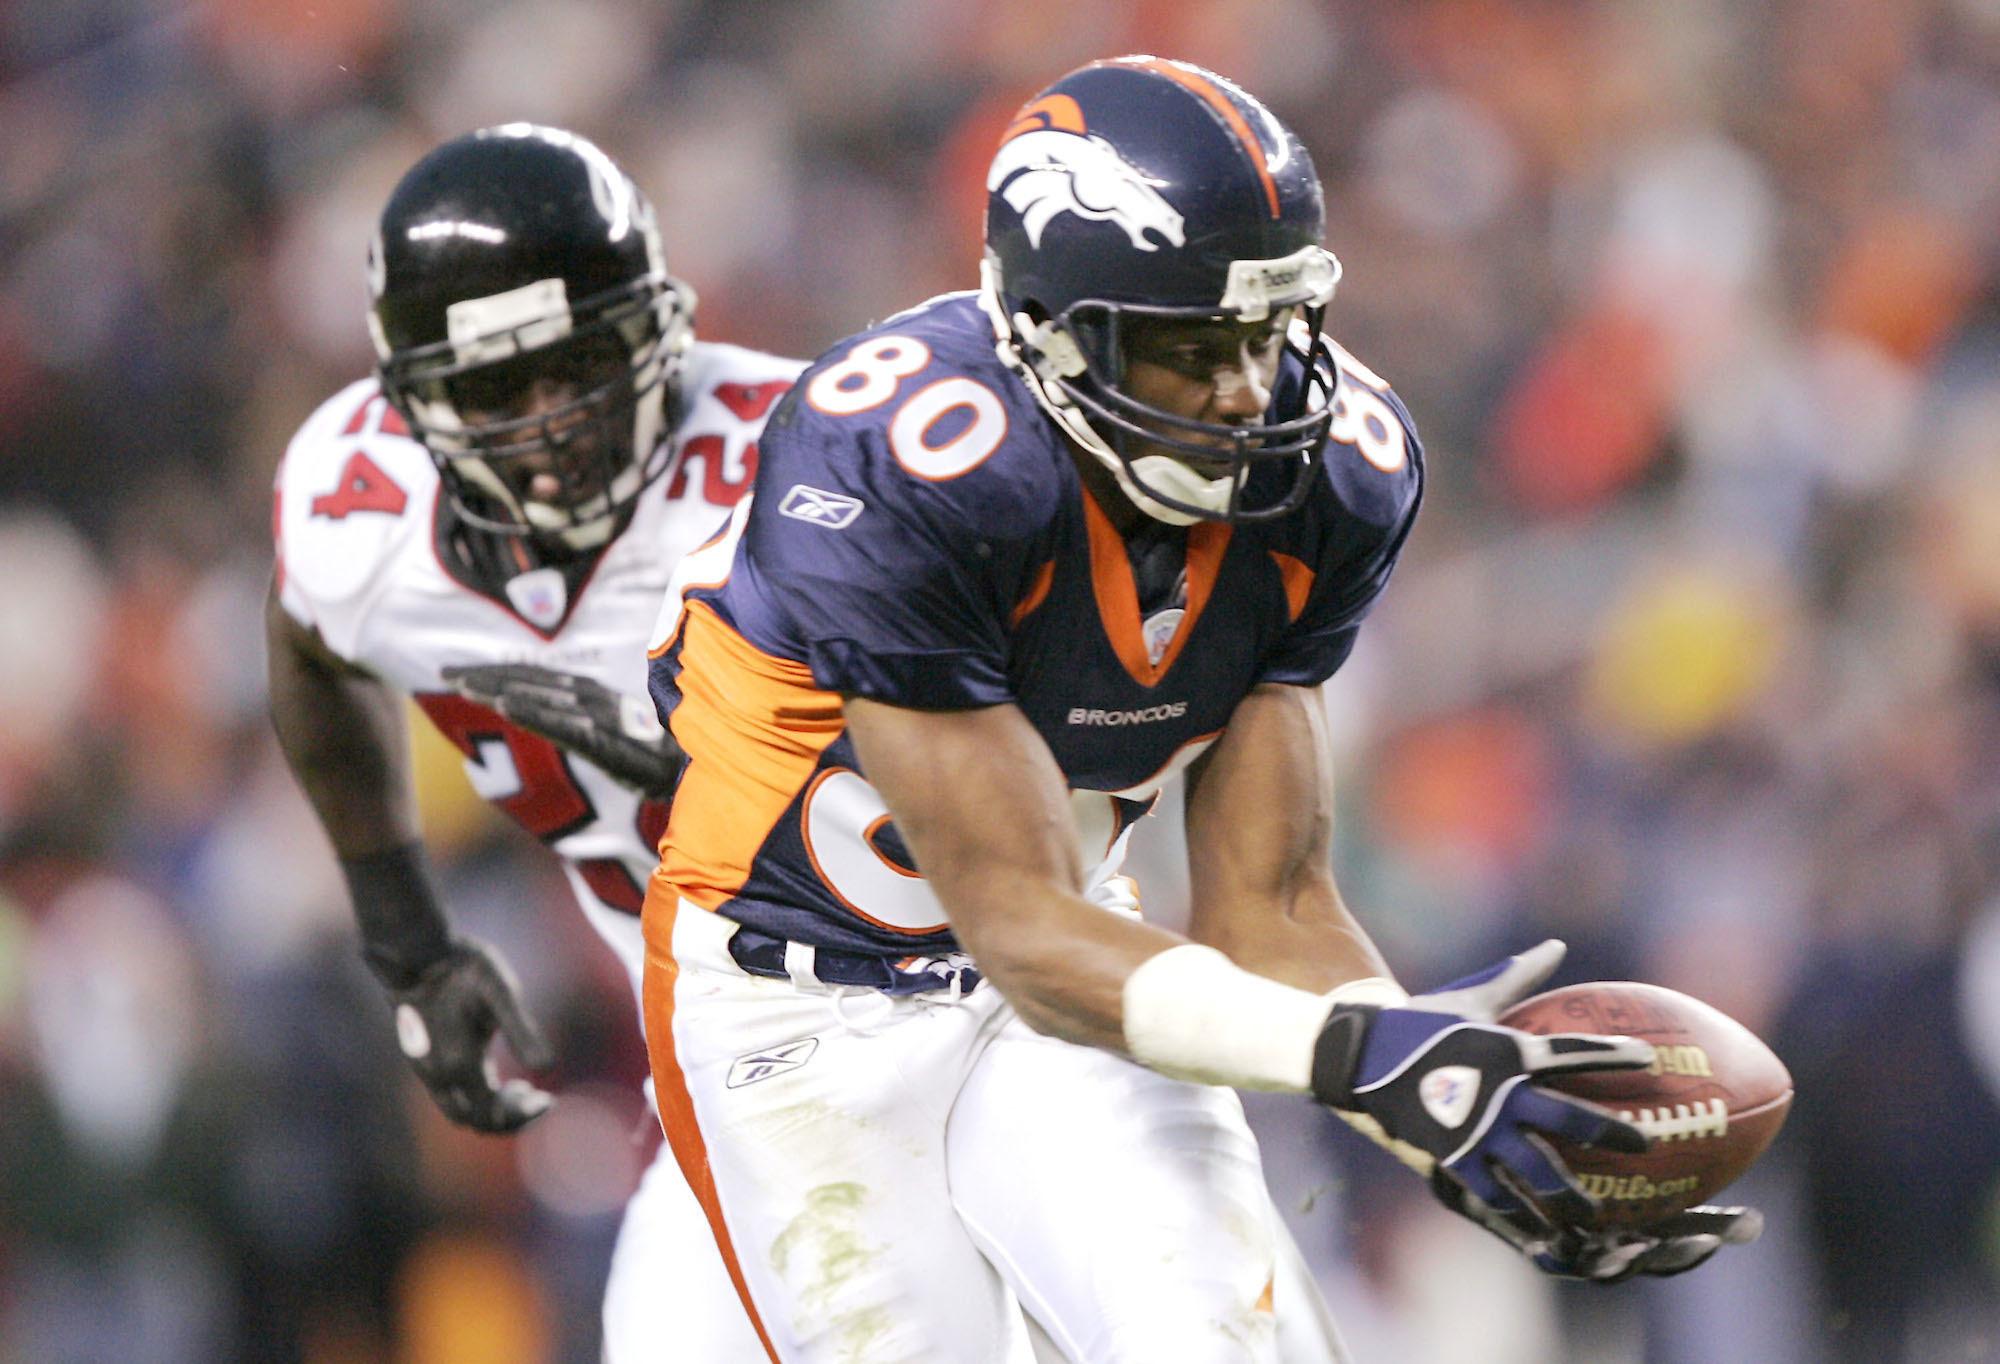 Wholesale NFL Nike Jerseys - Greatest undrafted players in NFL history | Yardbarker.com